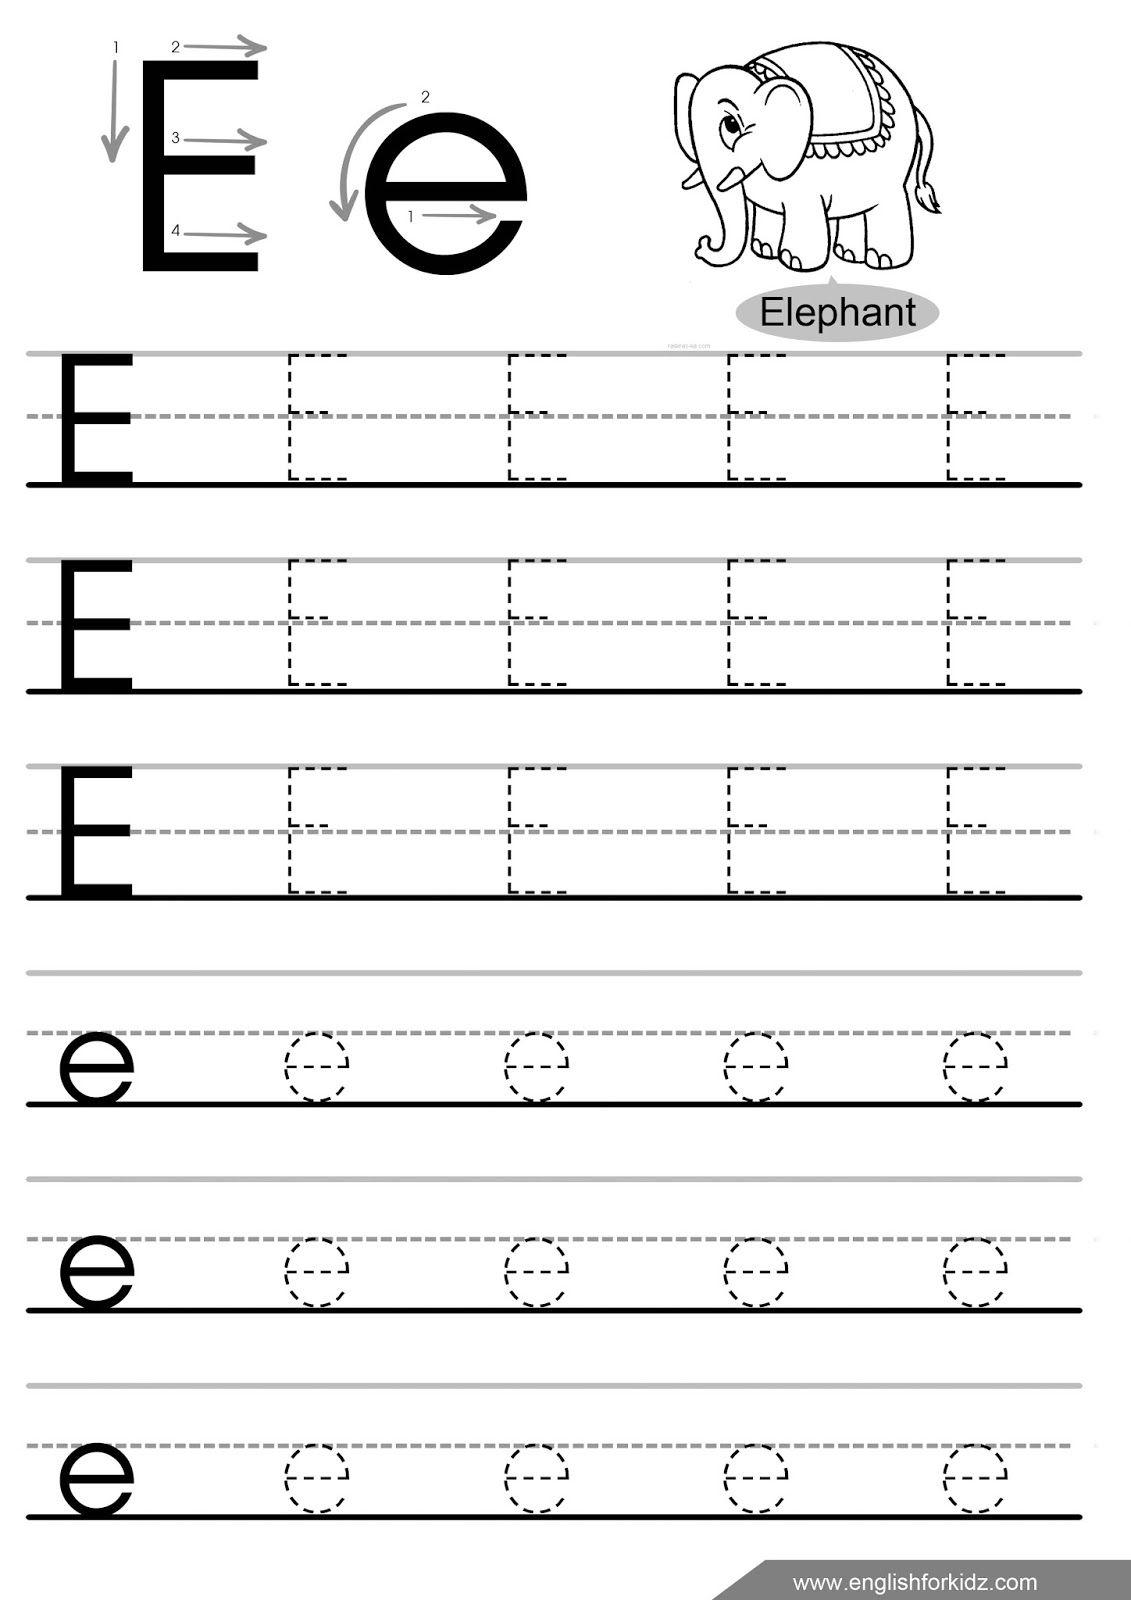 Letter Tracing Worksheets Letters A J In 2020 Tracing Worksheets Preschool Tracing Worksheets Letter Worksheets For Preschool